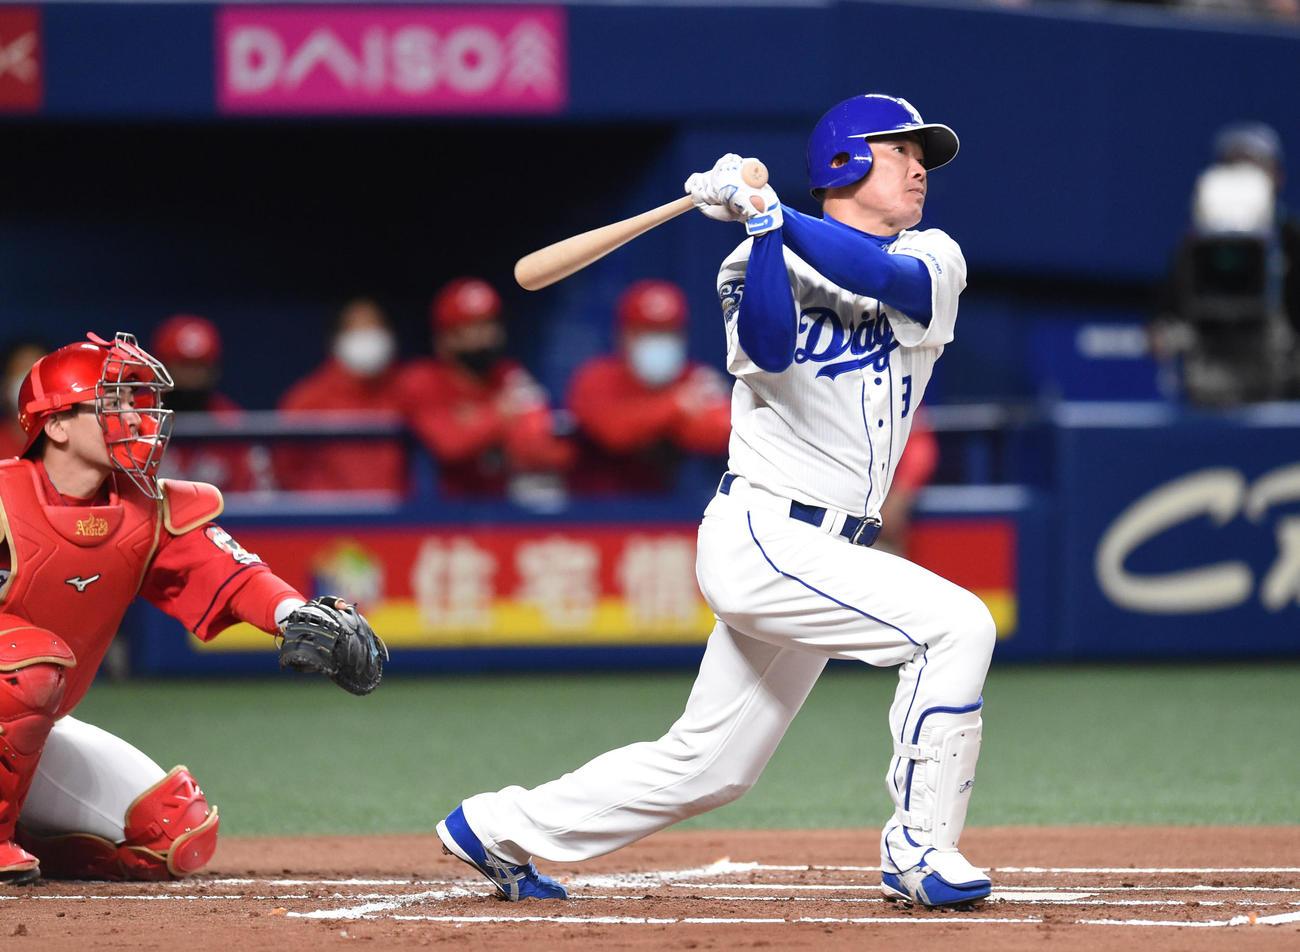 中日対広島 1回裏中日2死、右二塁打を放った福留(撮影・森本幸一)